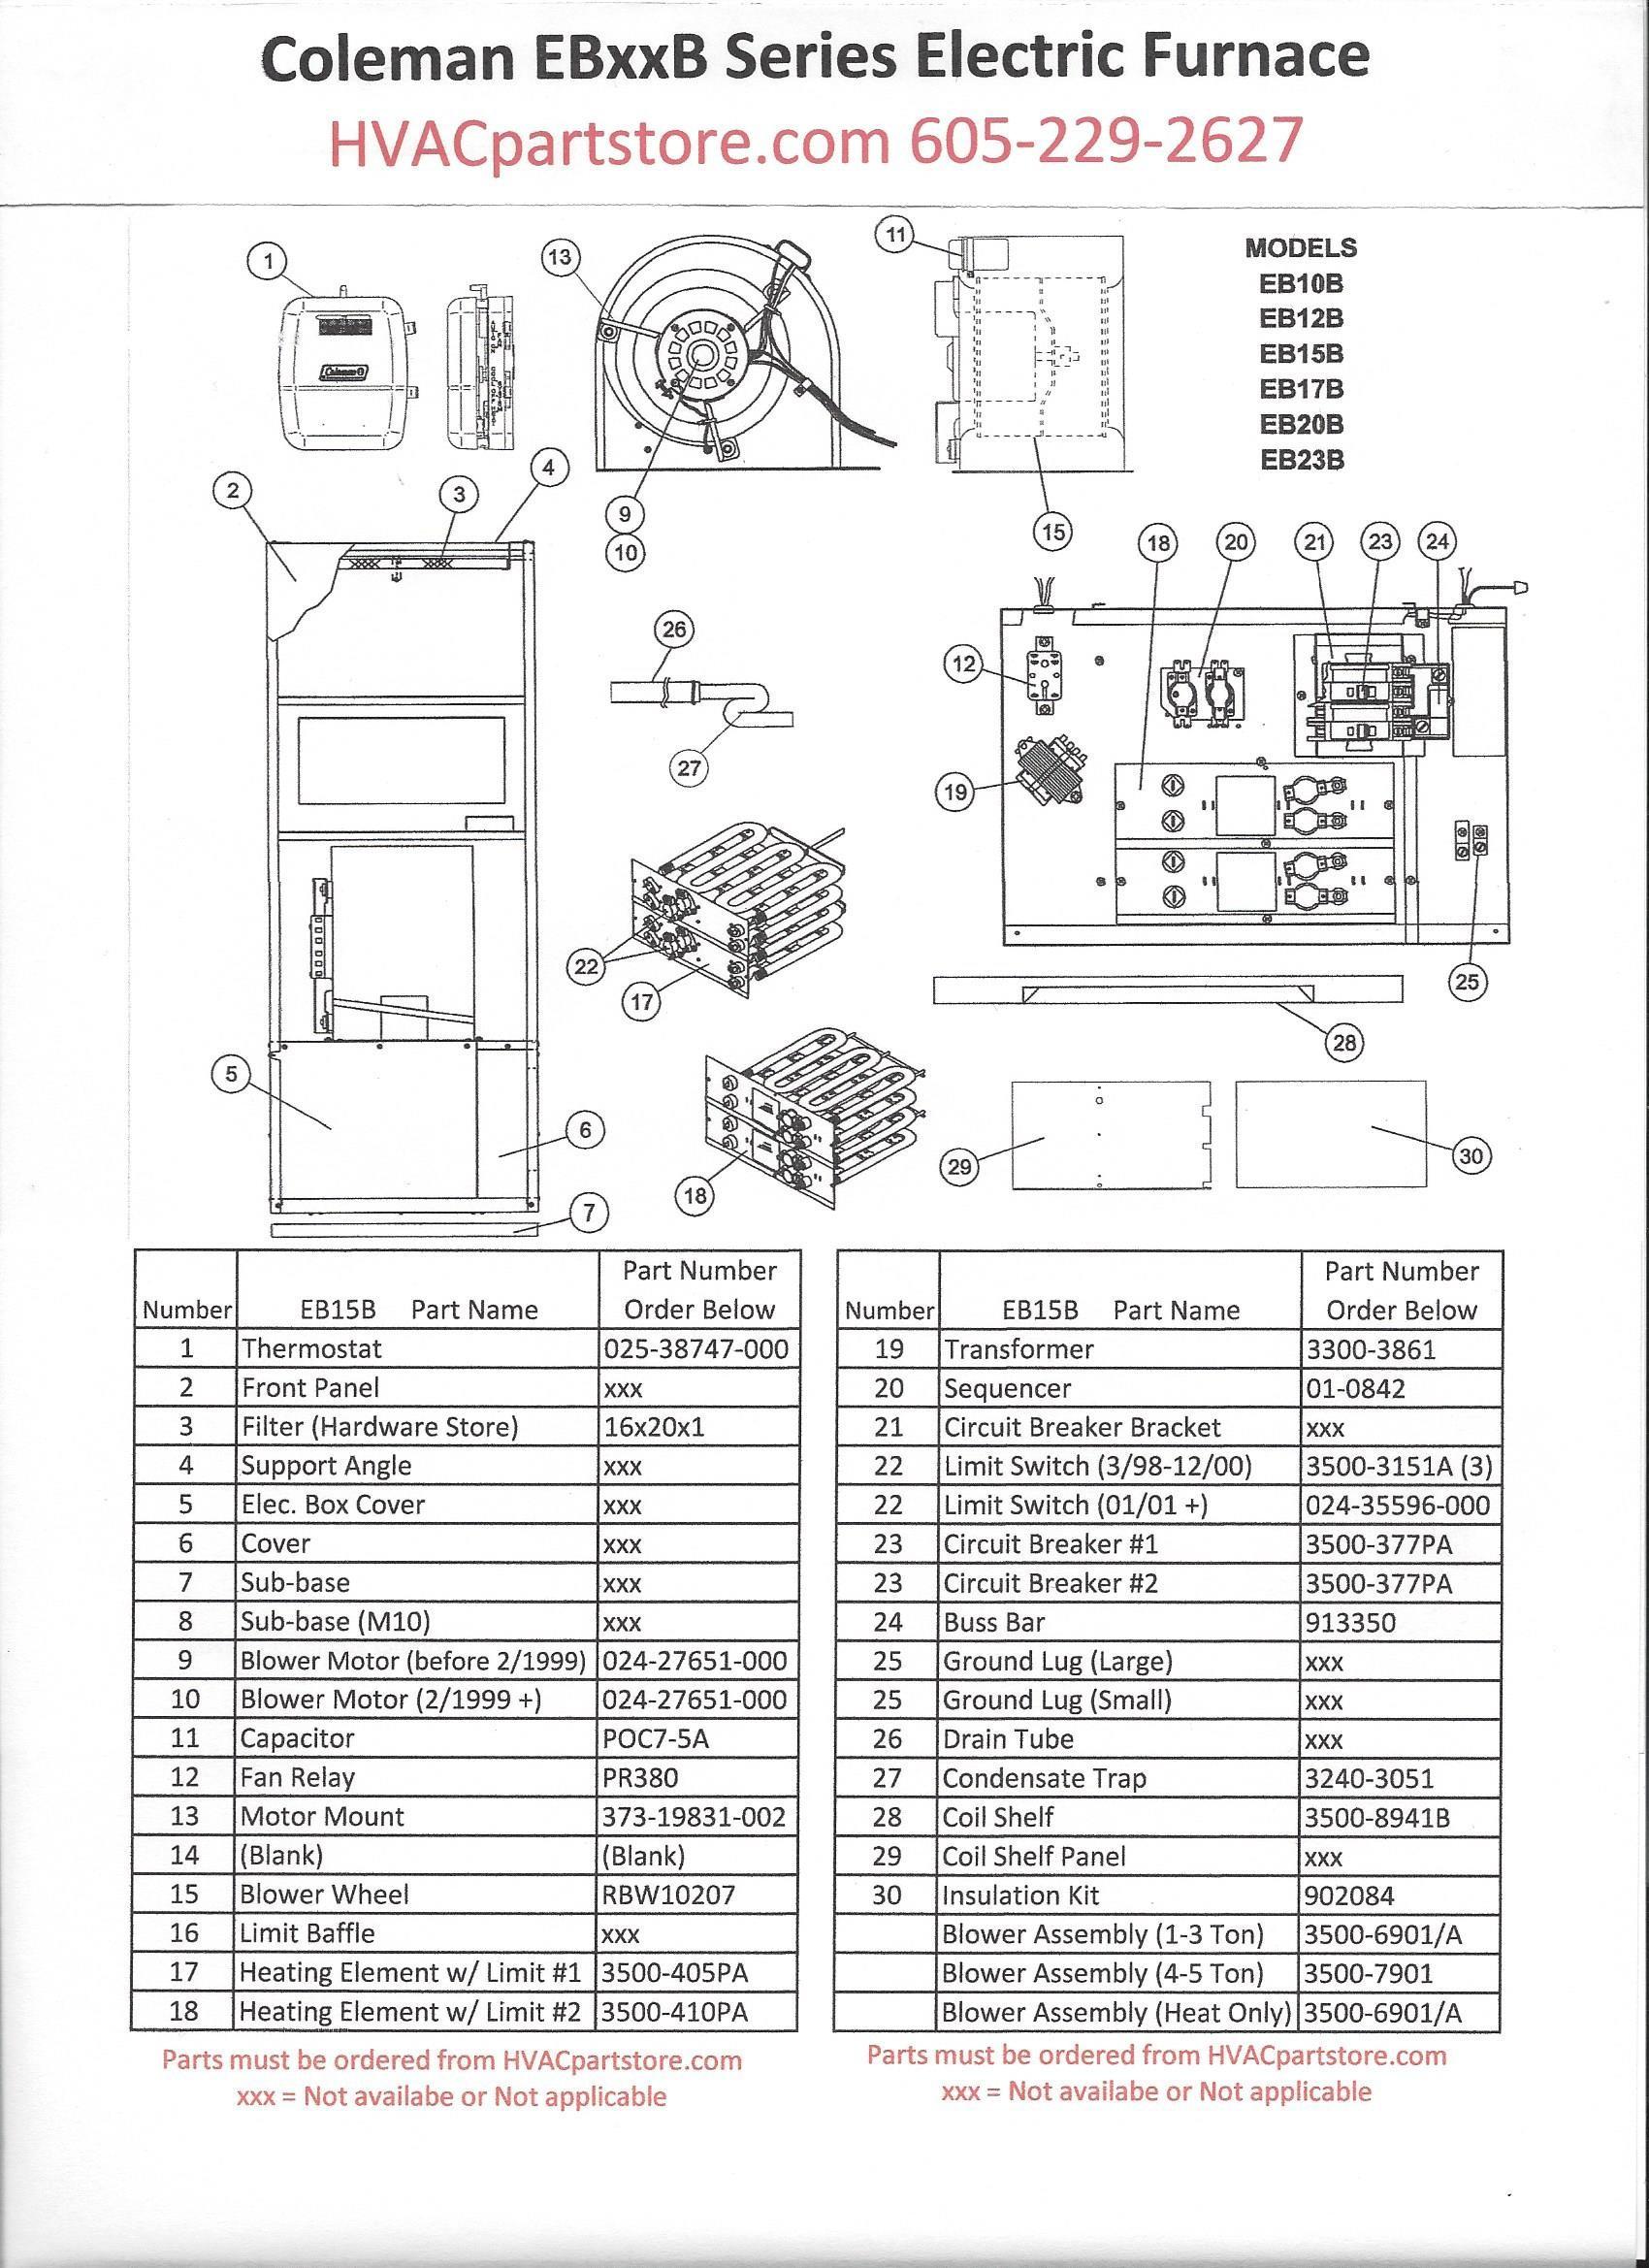 Intertherm Electric Furnace Manual